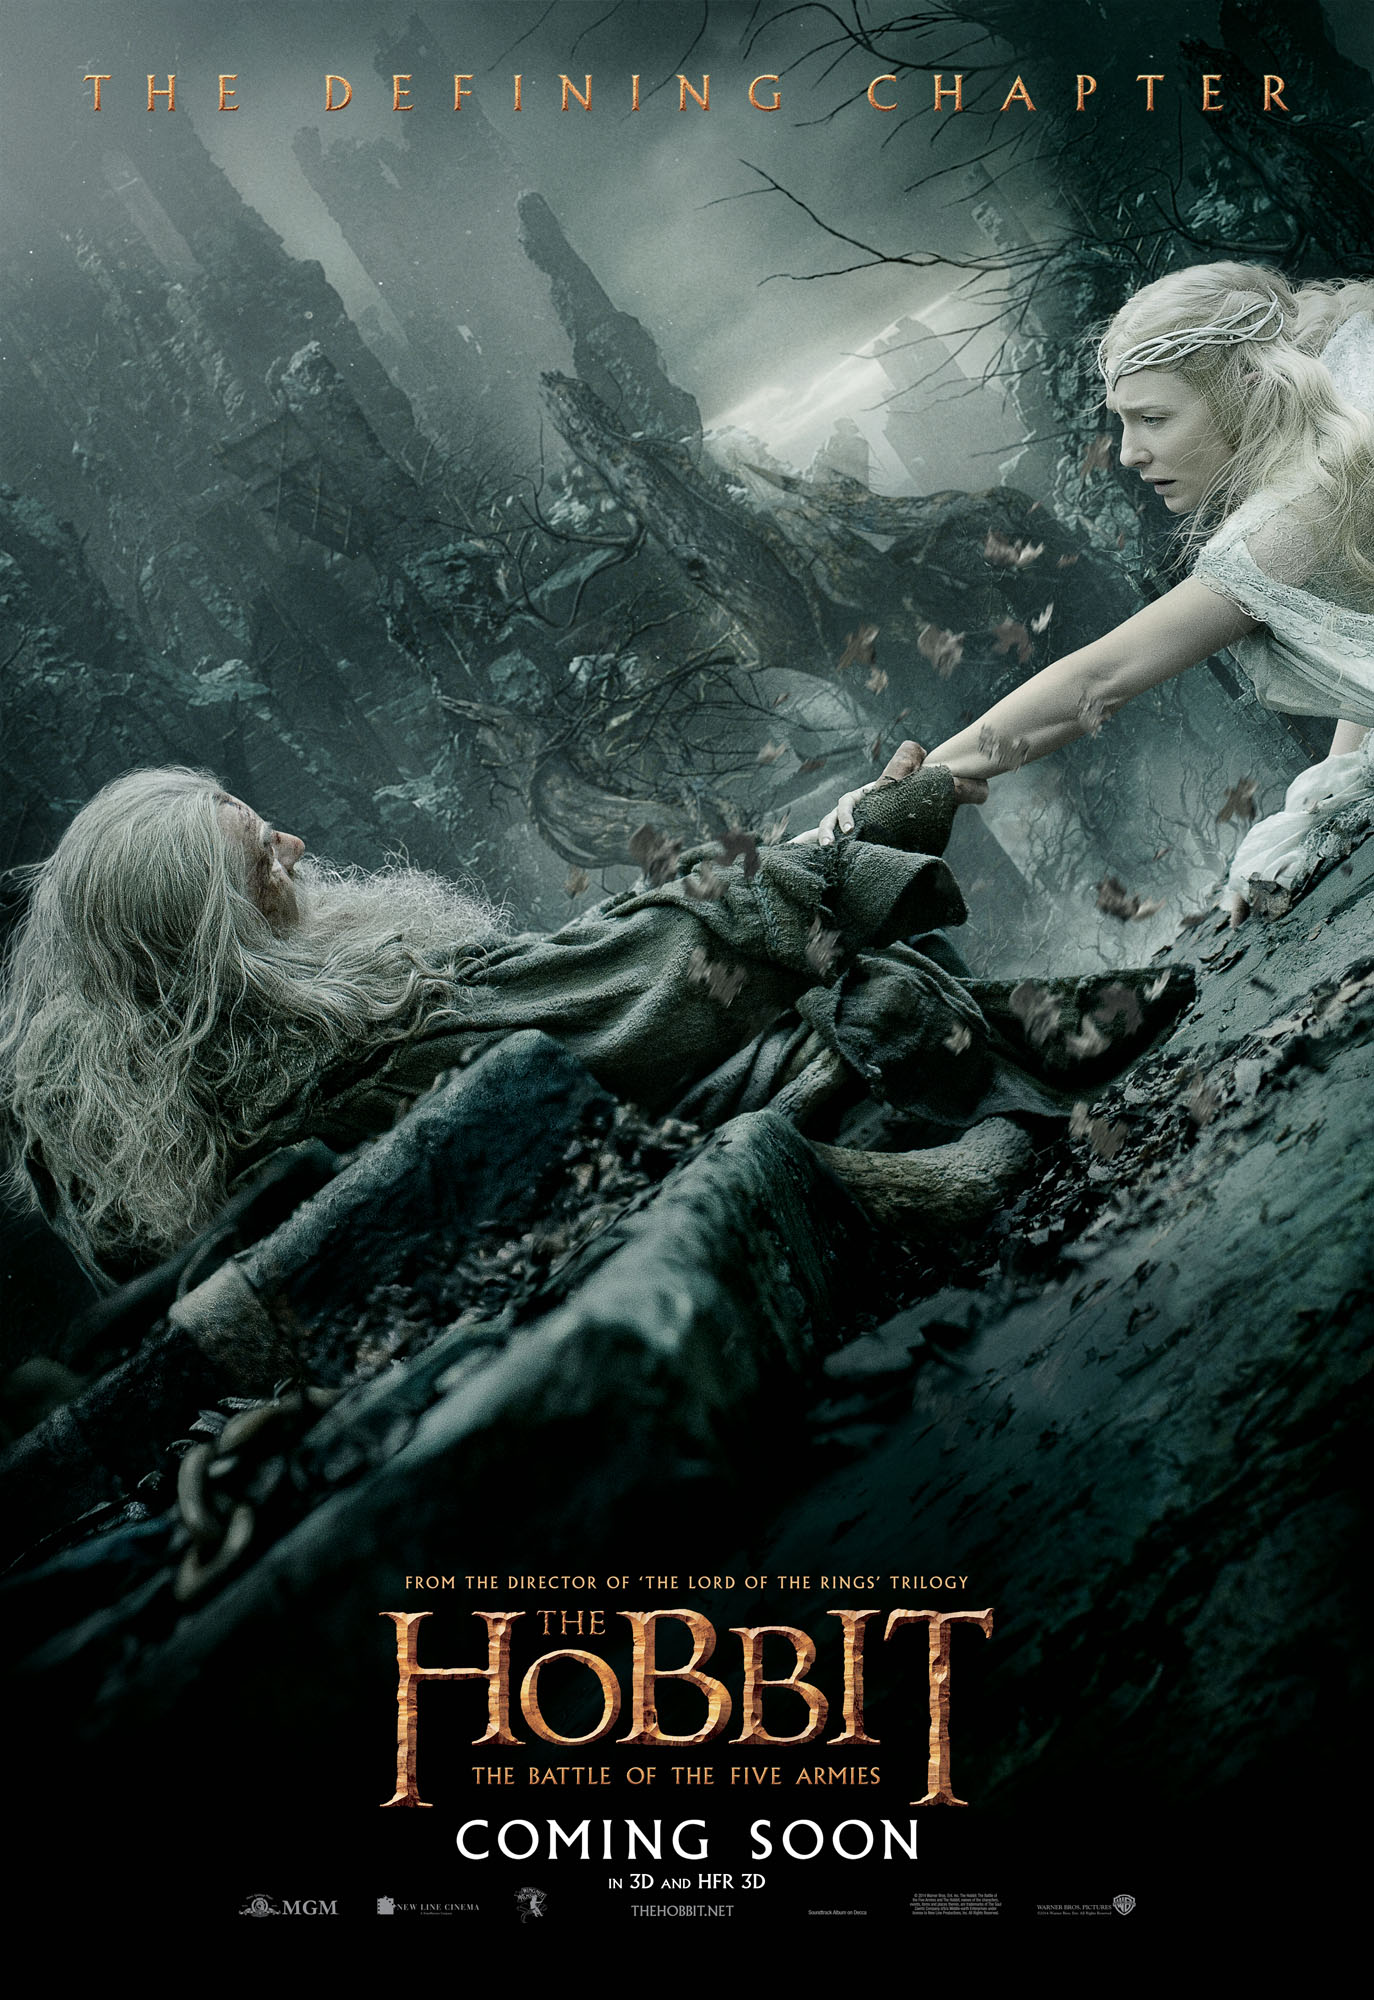 Le Seigneur des Anneaux / The Hobbit #3 HBFA_Bus_Reach_RGB_INTL_master